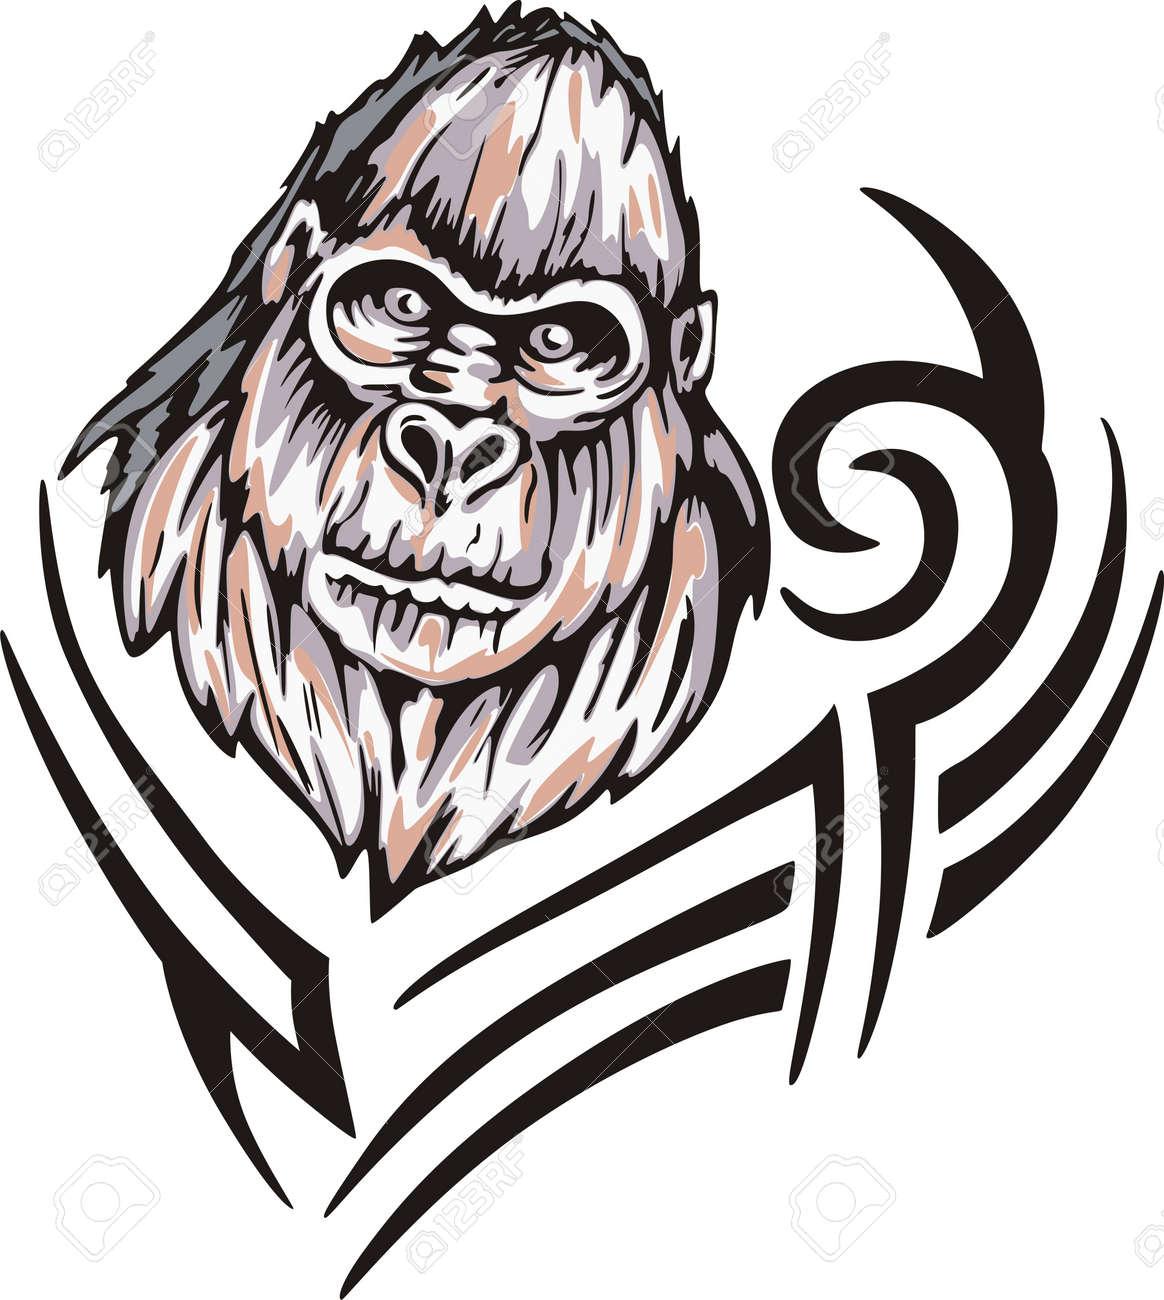 Tattoo with gorilla head. Color vector illustration. Stock Vector - 14953068